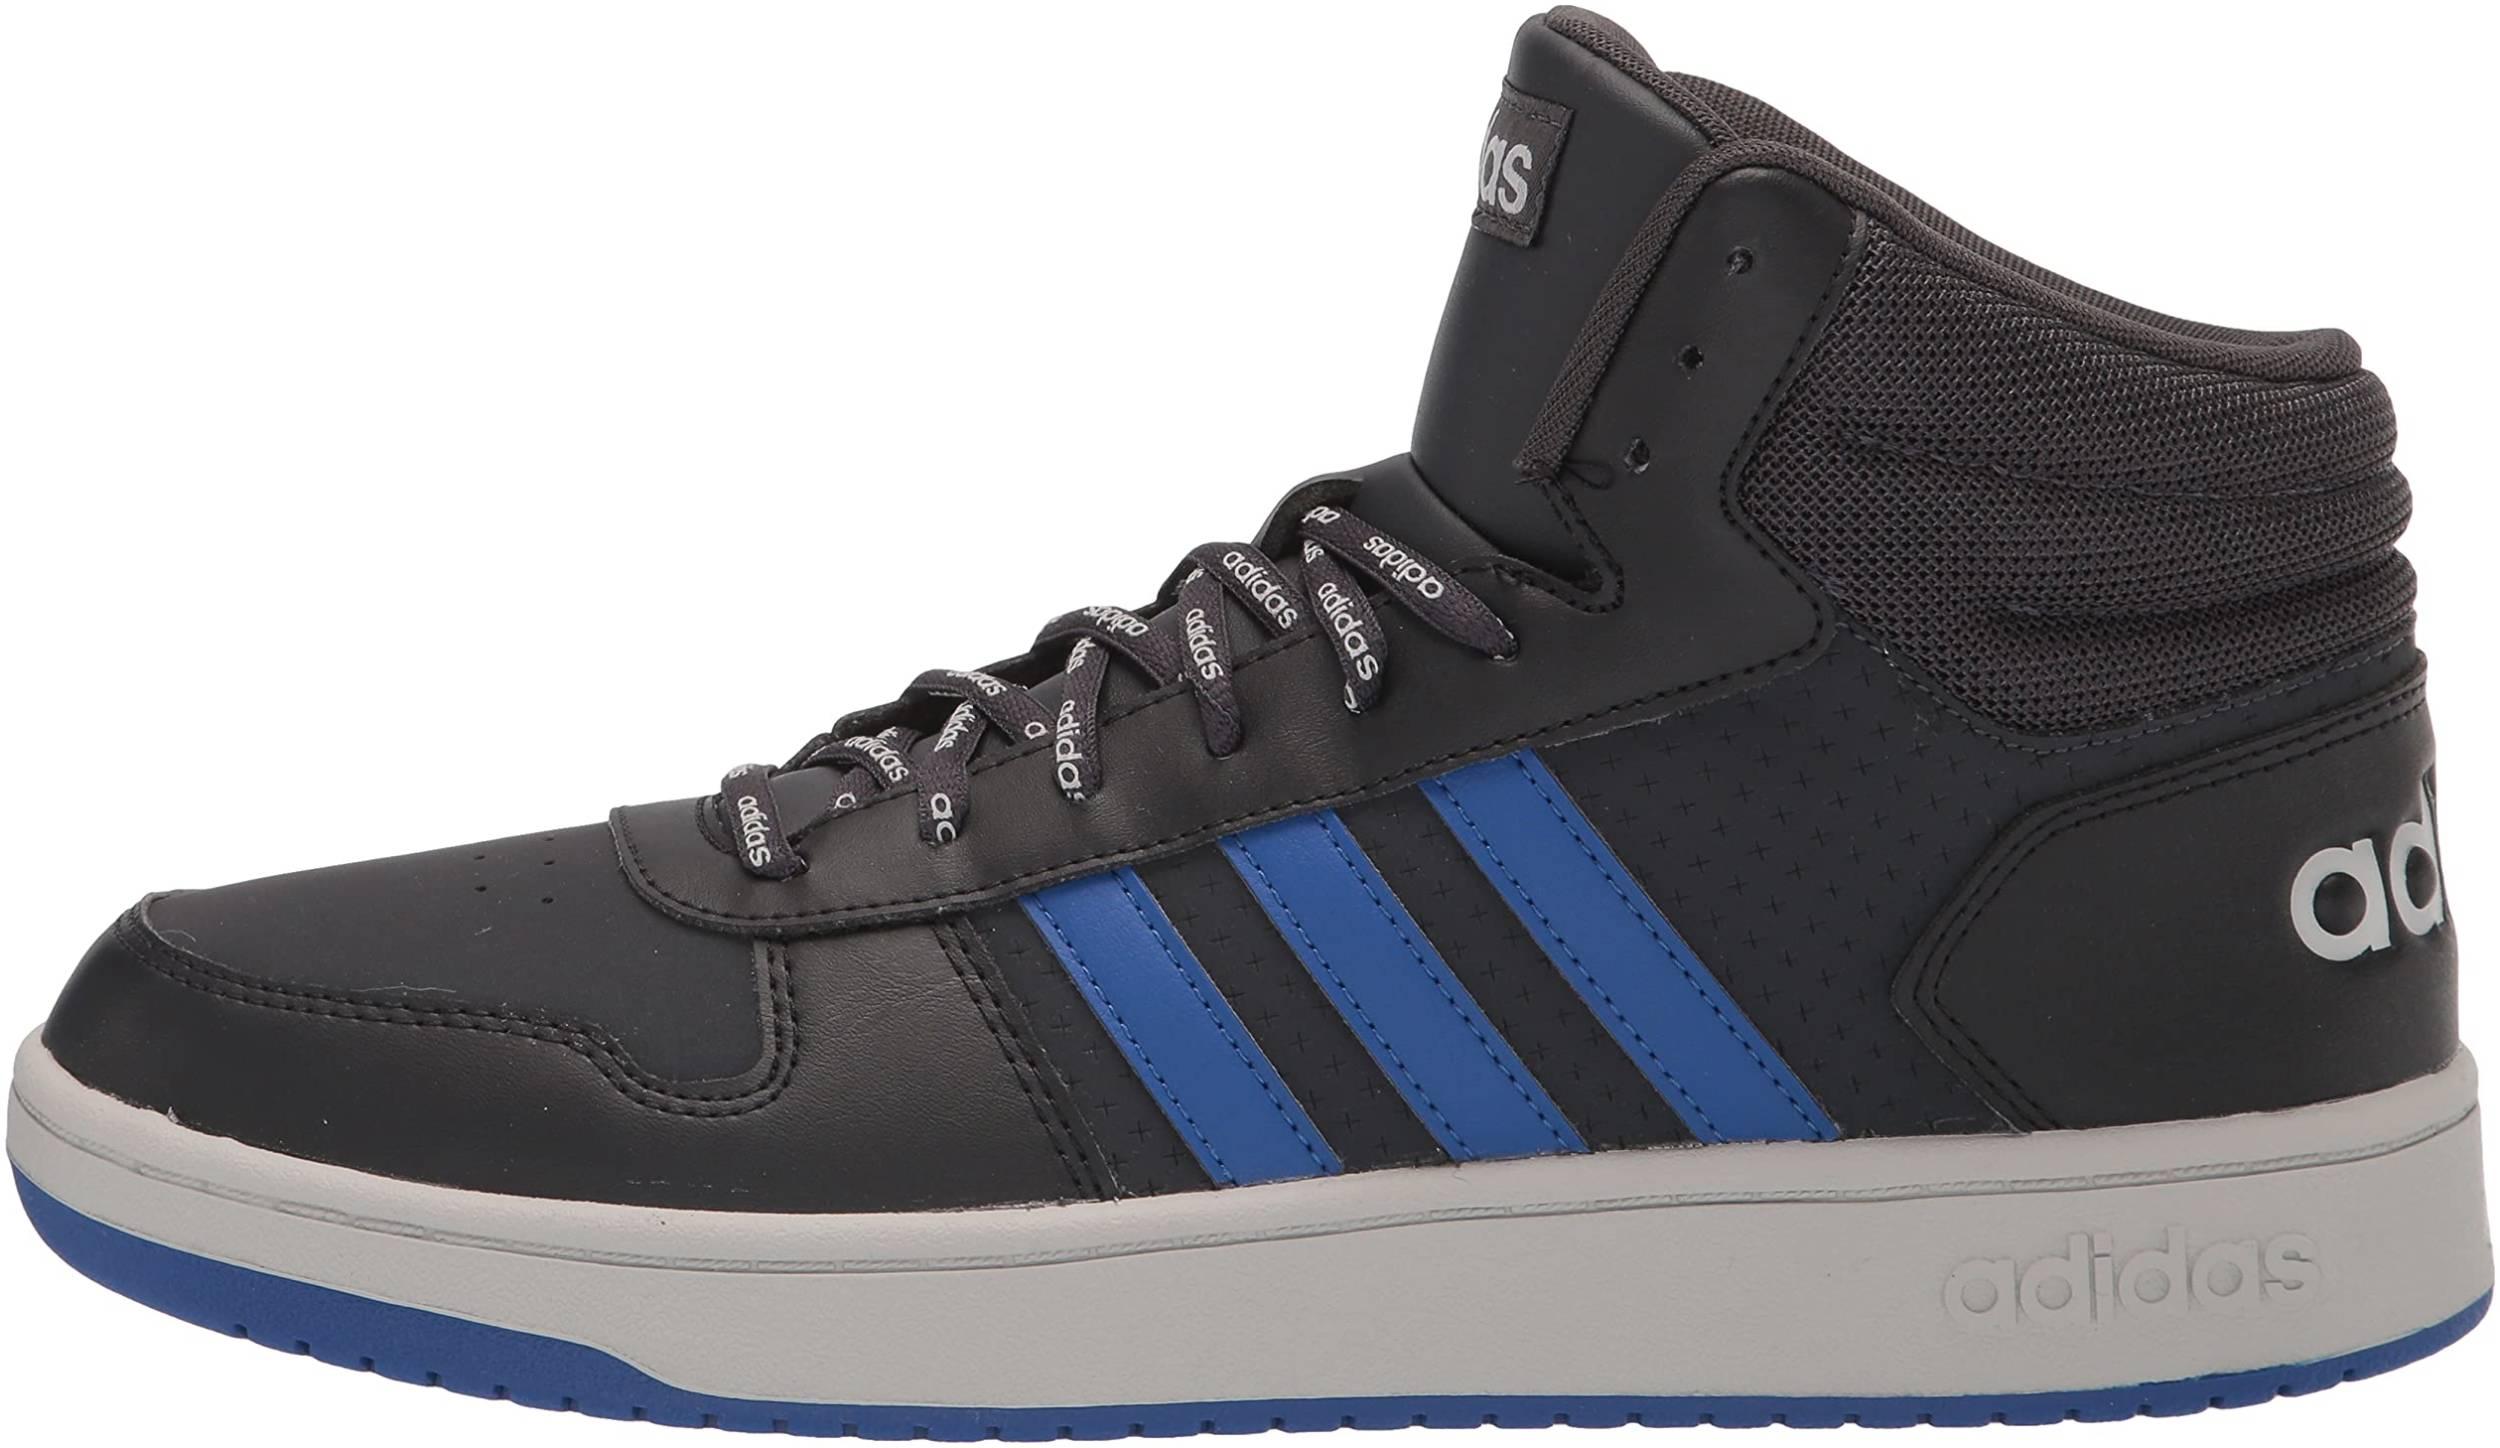 Adidas Hoops 2.0 Mid sneakers in 10 colors (only £32) | RunRepeat